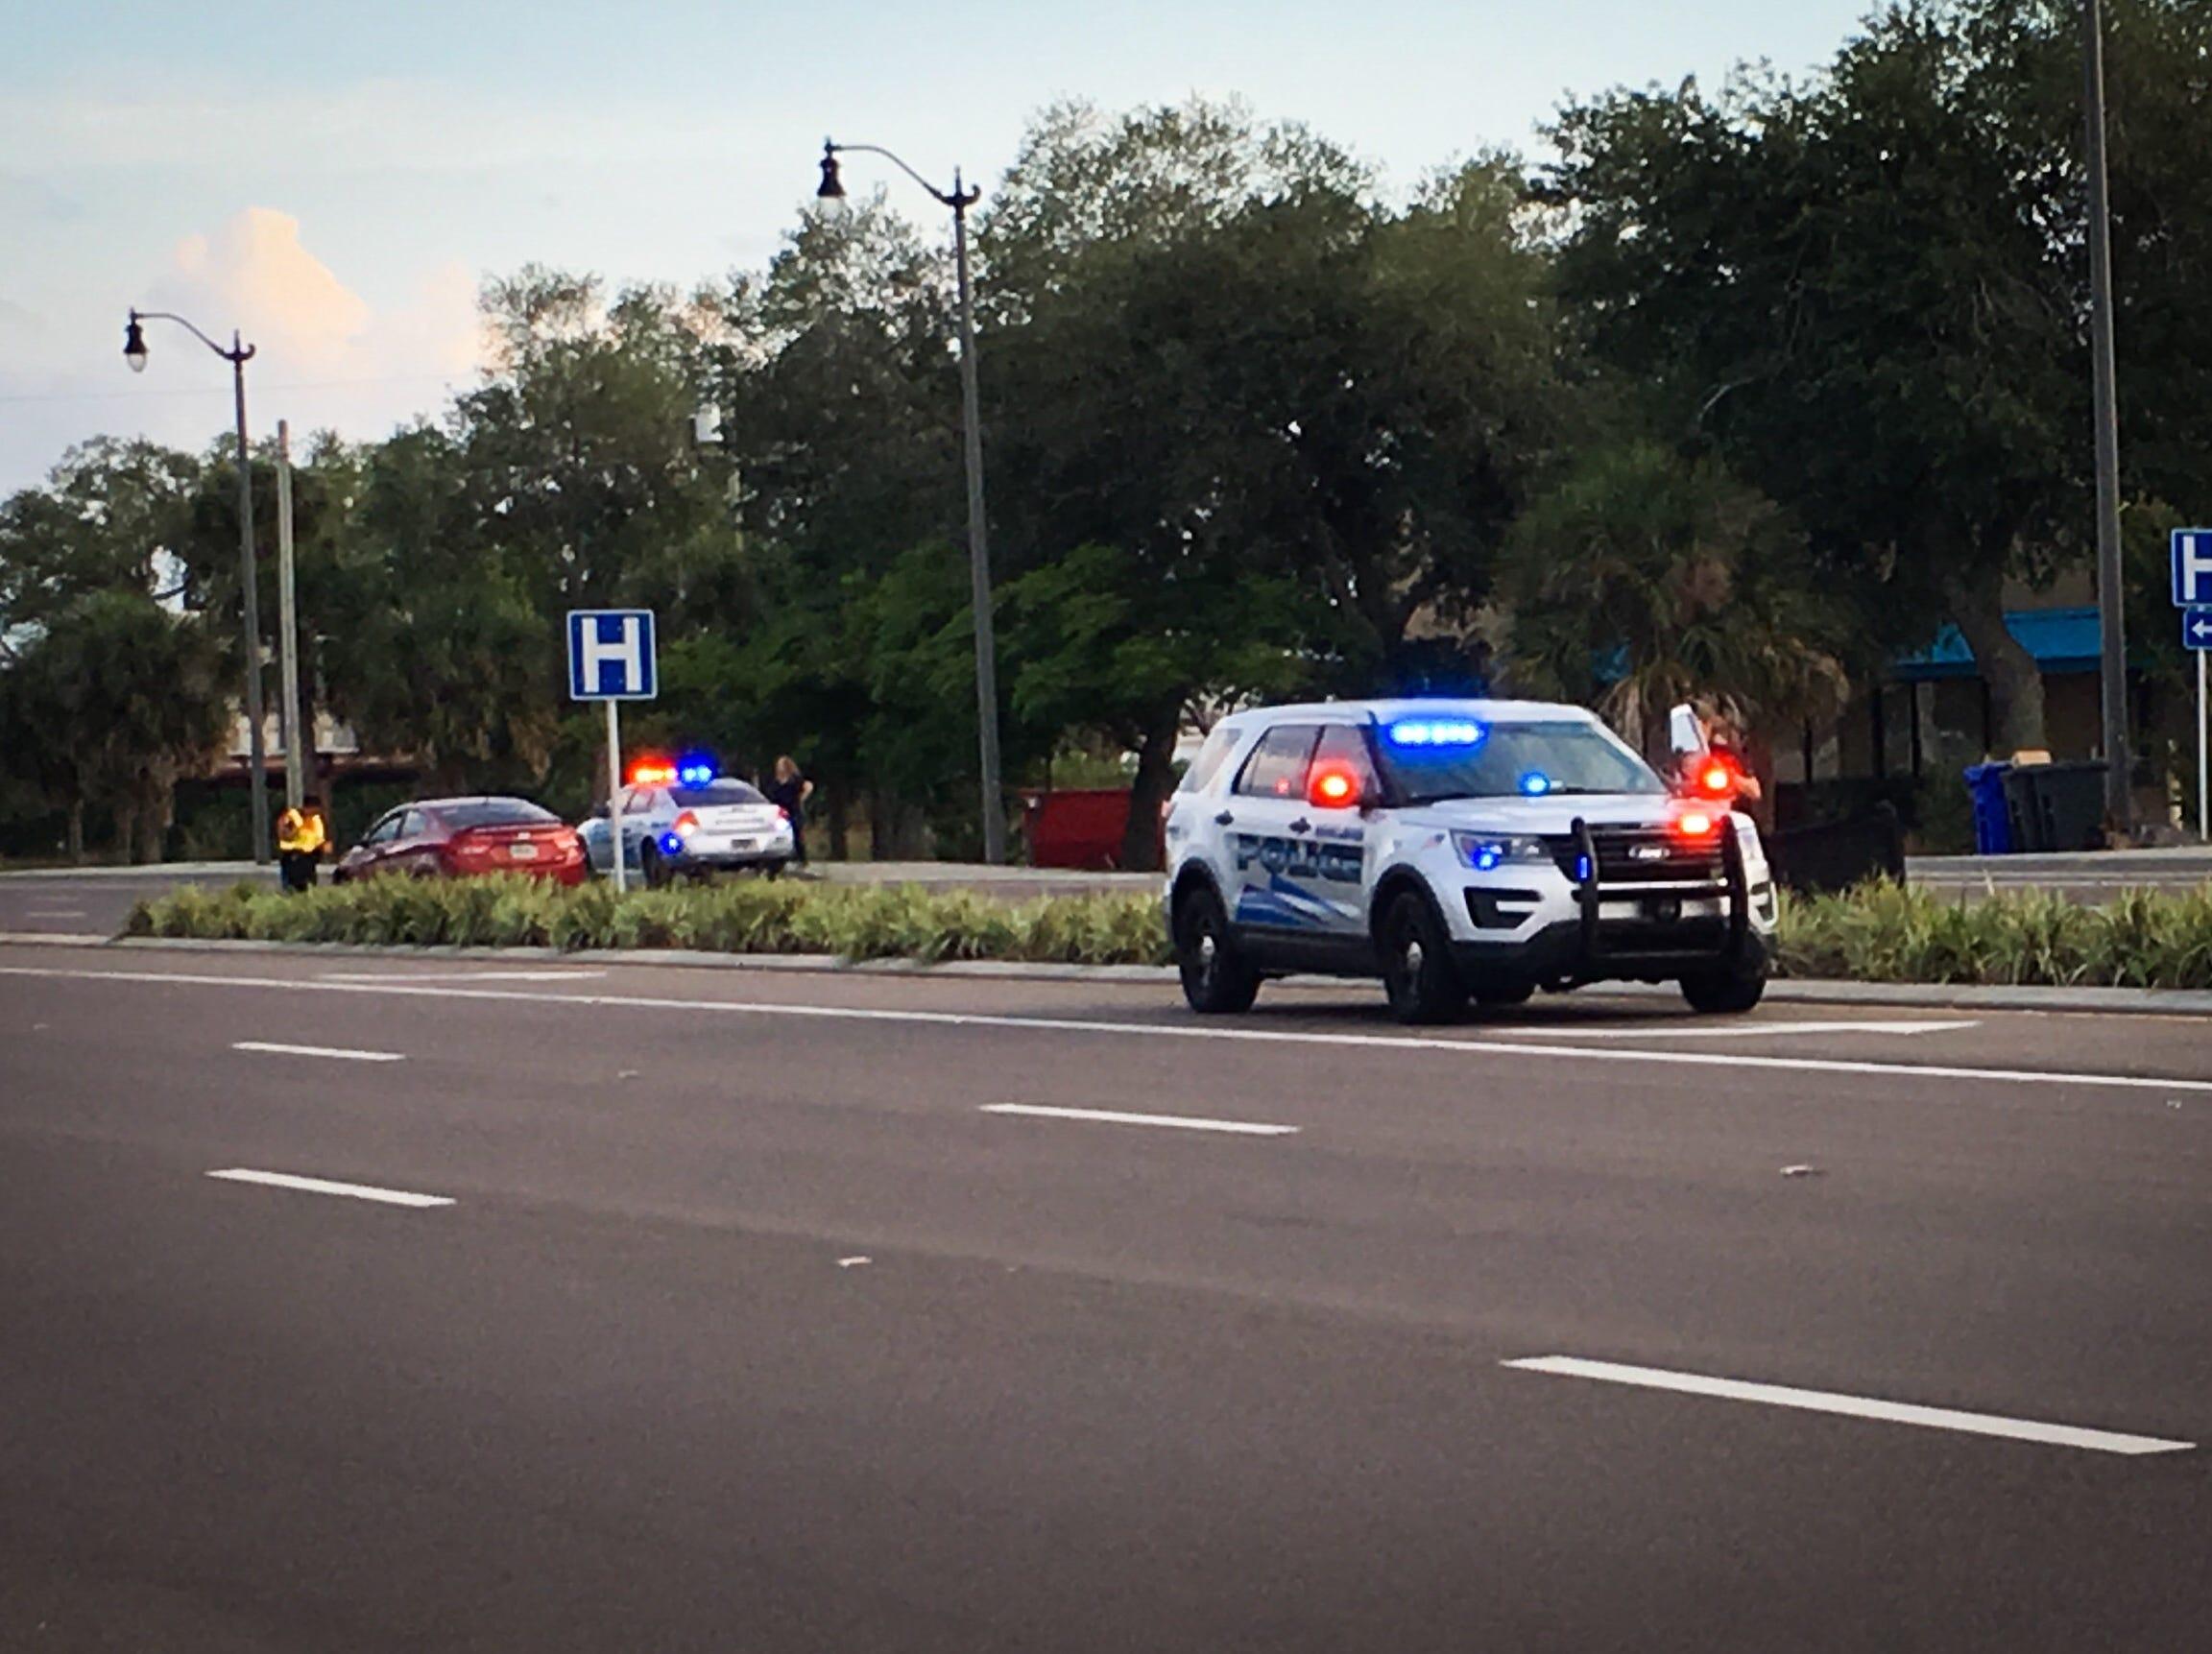 Rockledge police are investigating a crash along U.S. 1 and Florida Avenue.